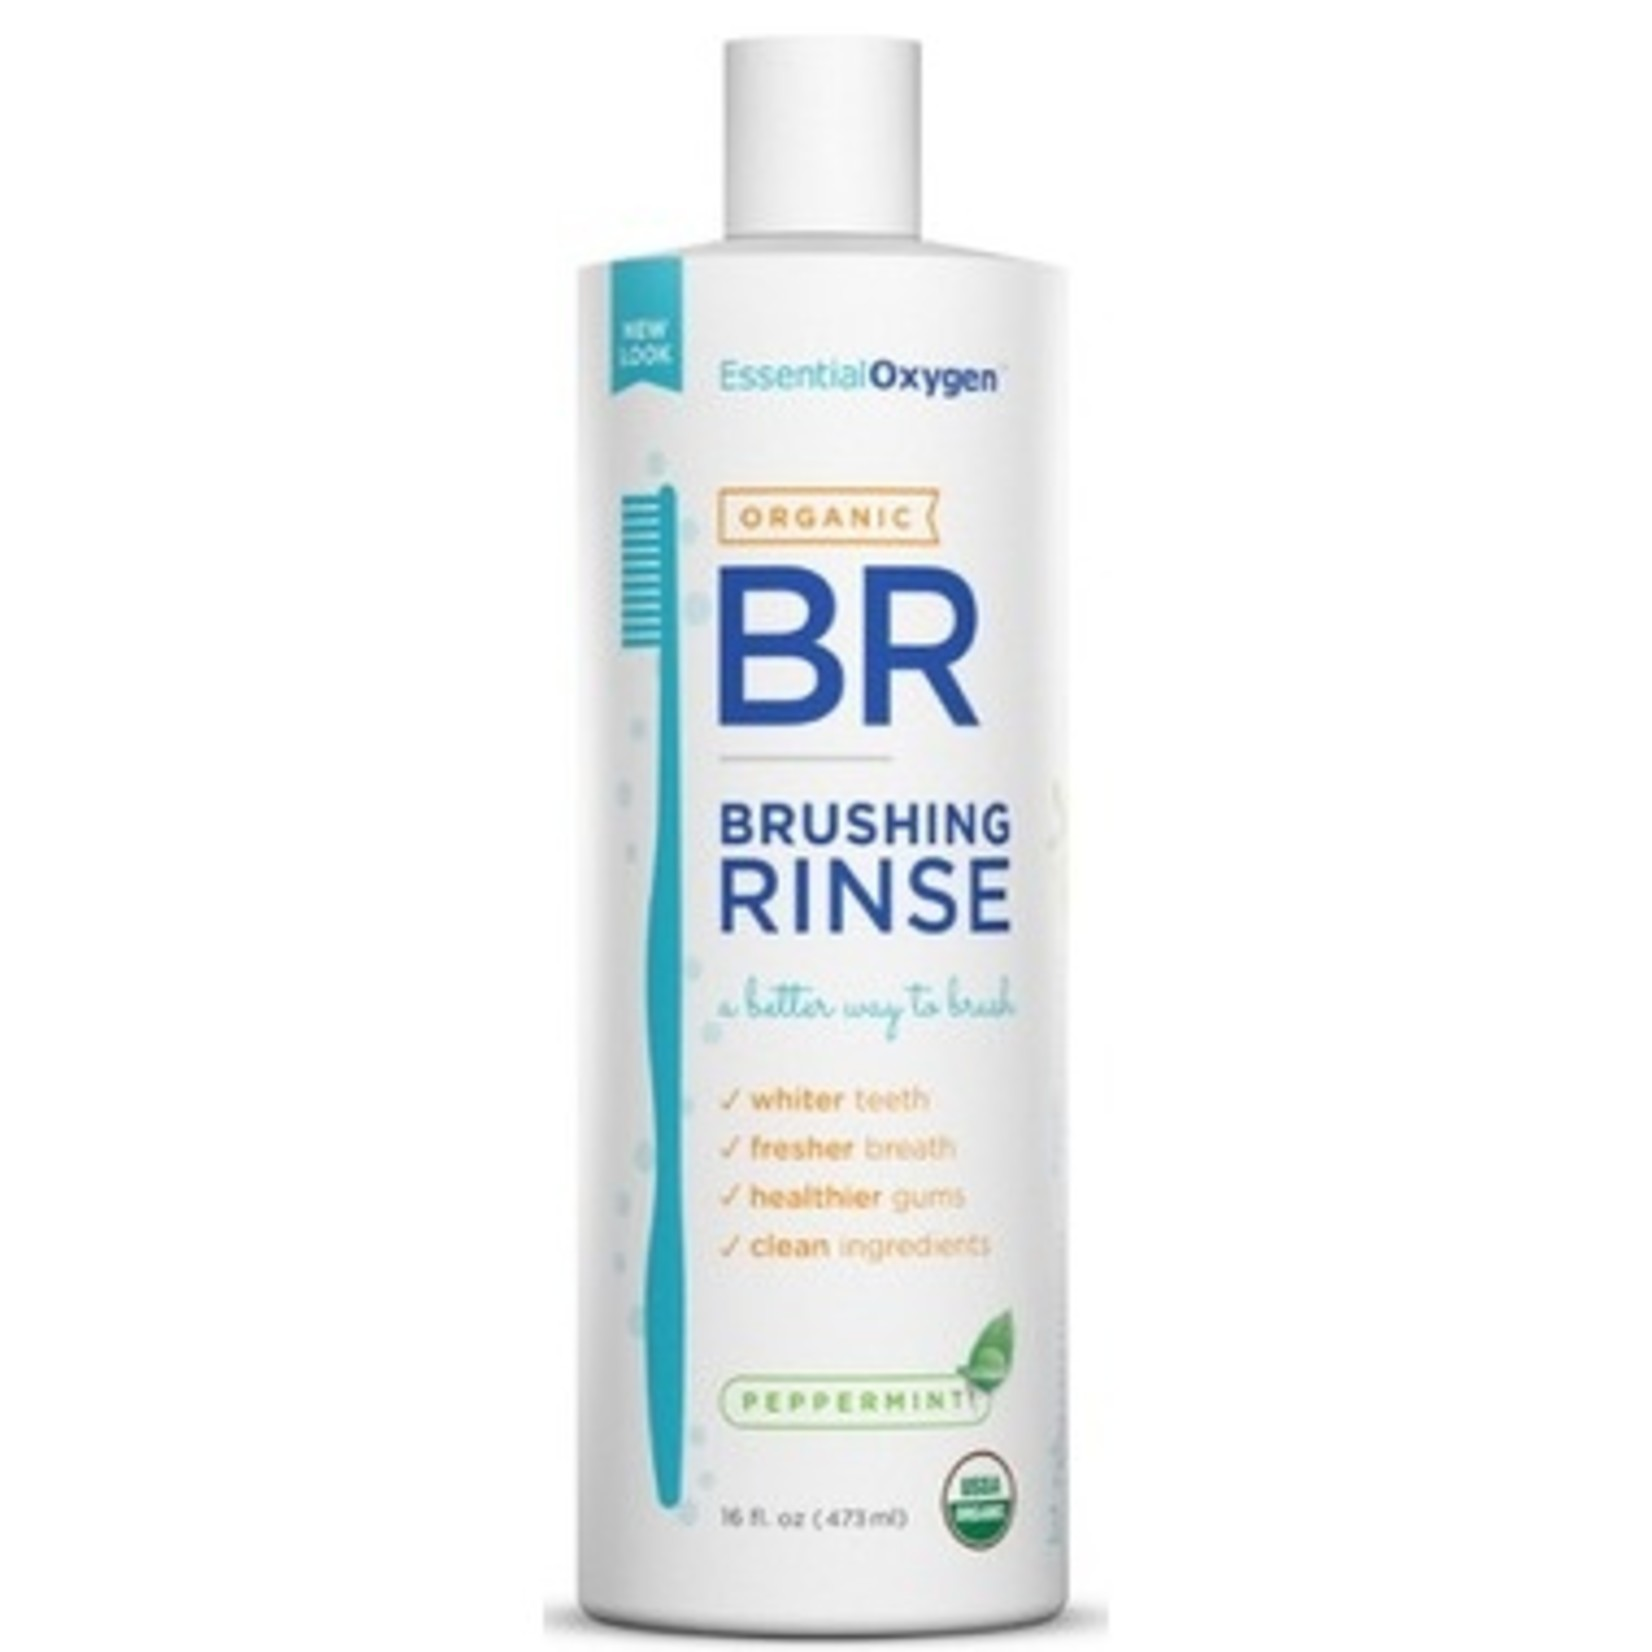 Essential Oxygen Essential Oxygen Brushing Rinse Organic Peppermint 16oz